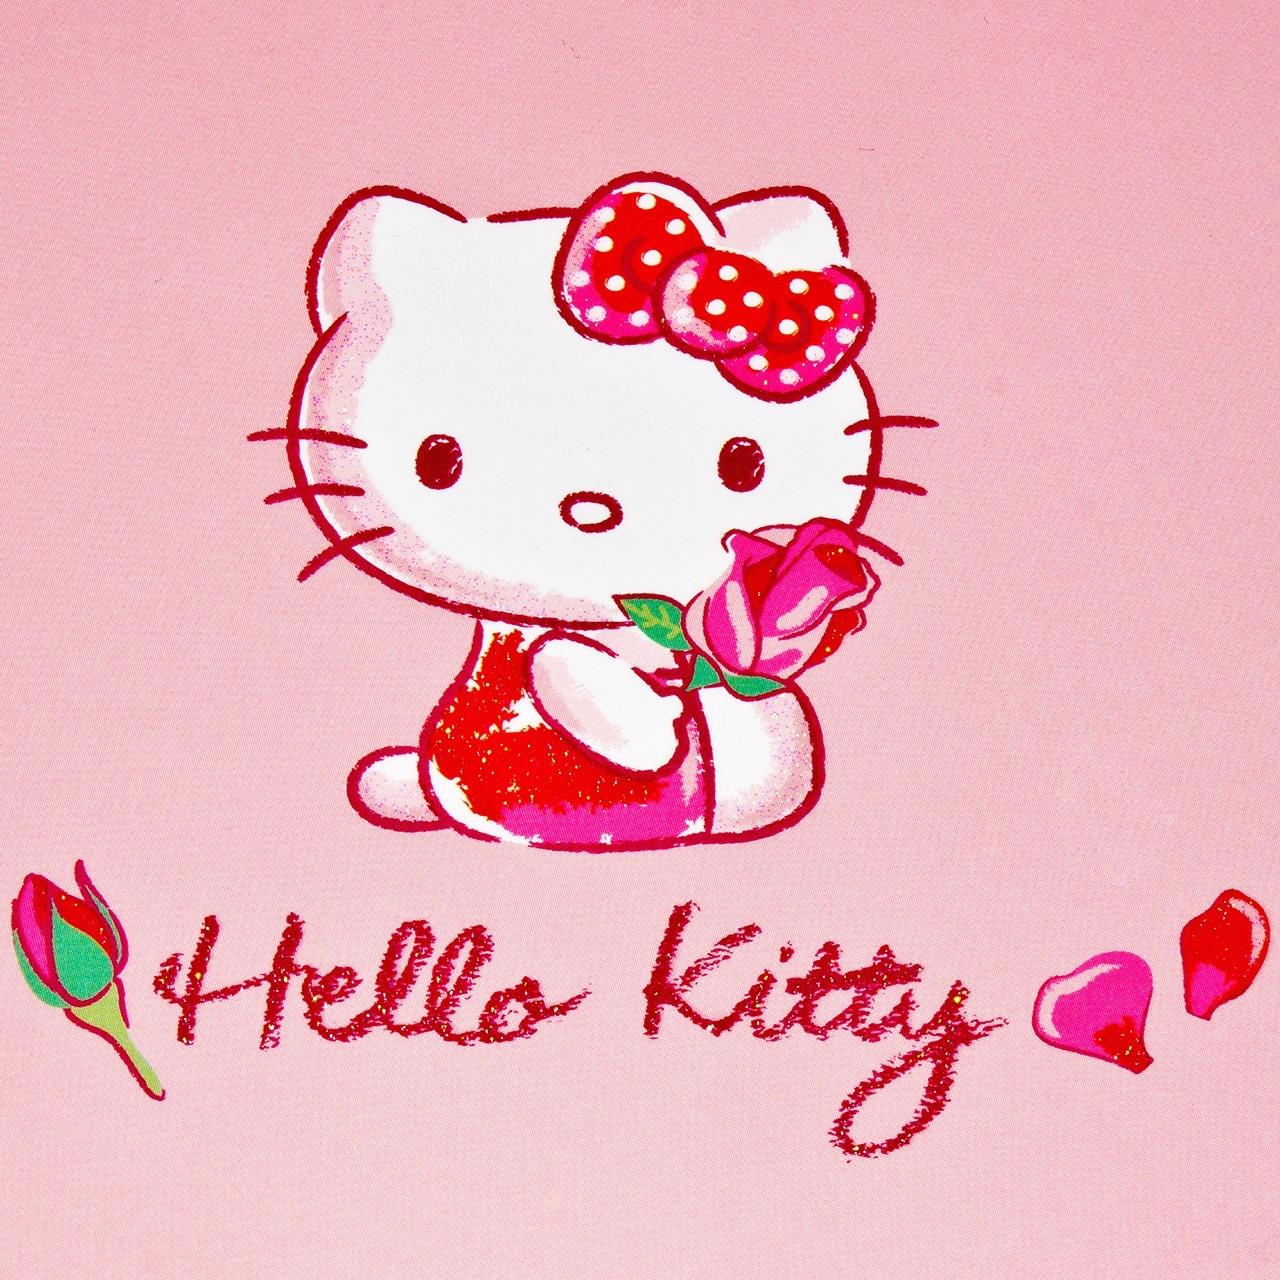 Top Kitty Image